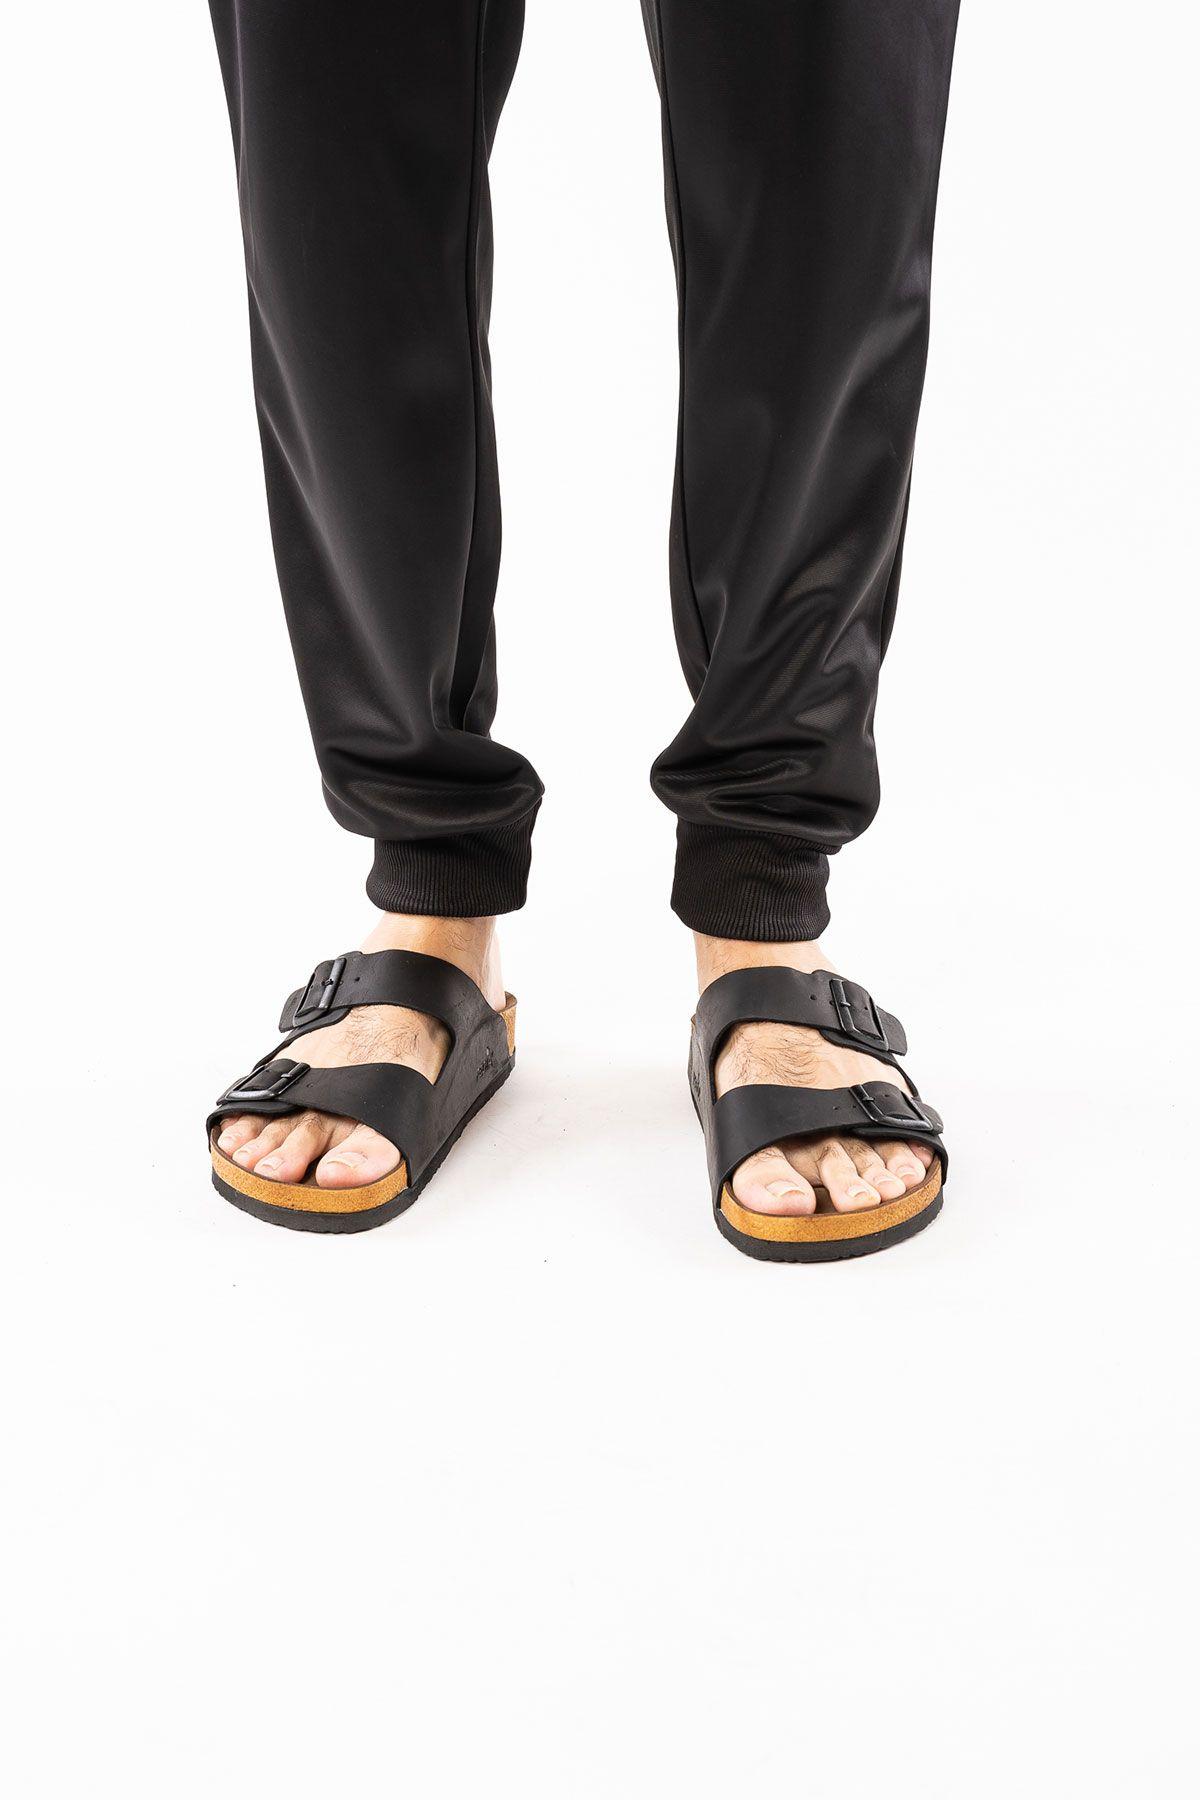 Pegia Genuine Leather Men's Slippers 215010 Black